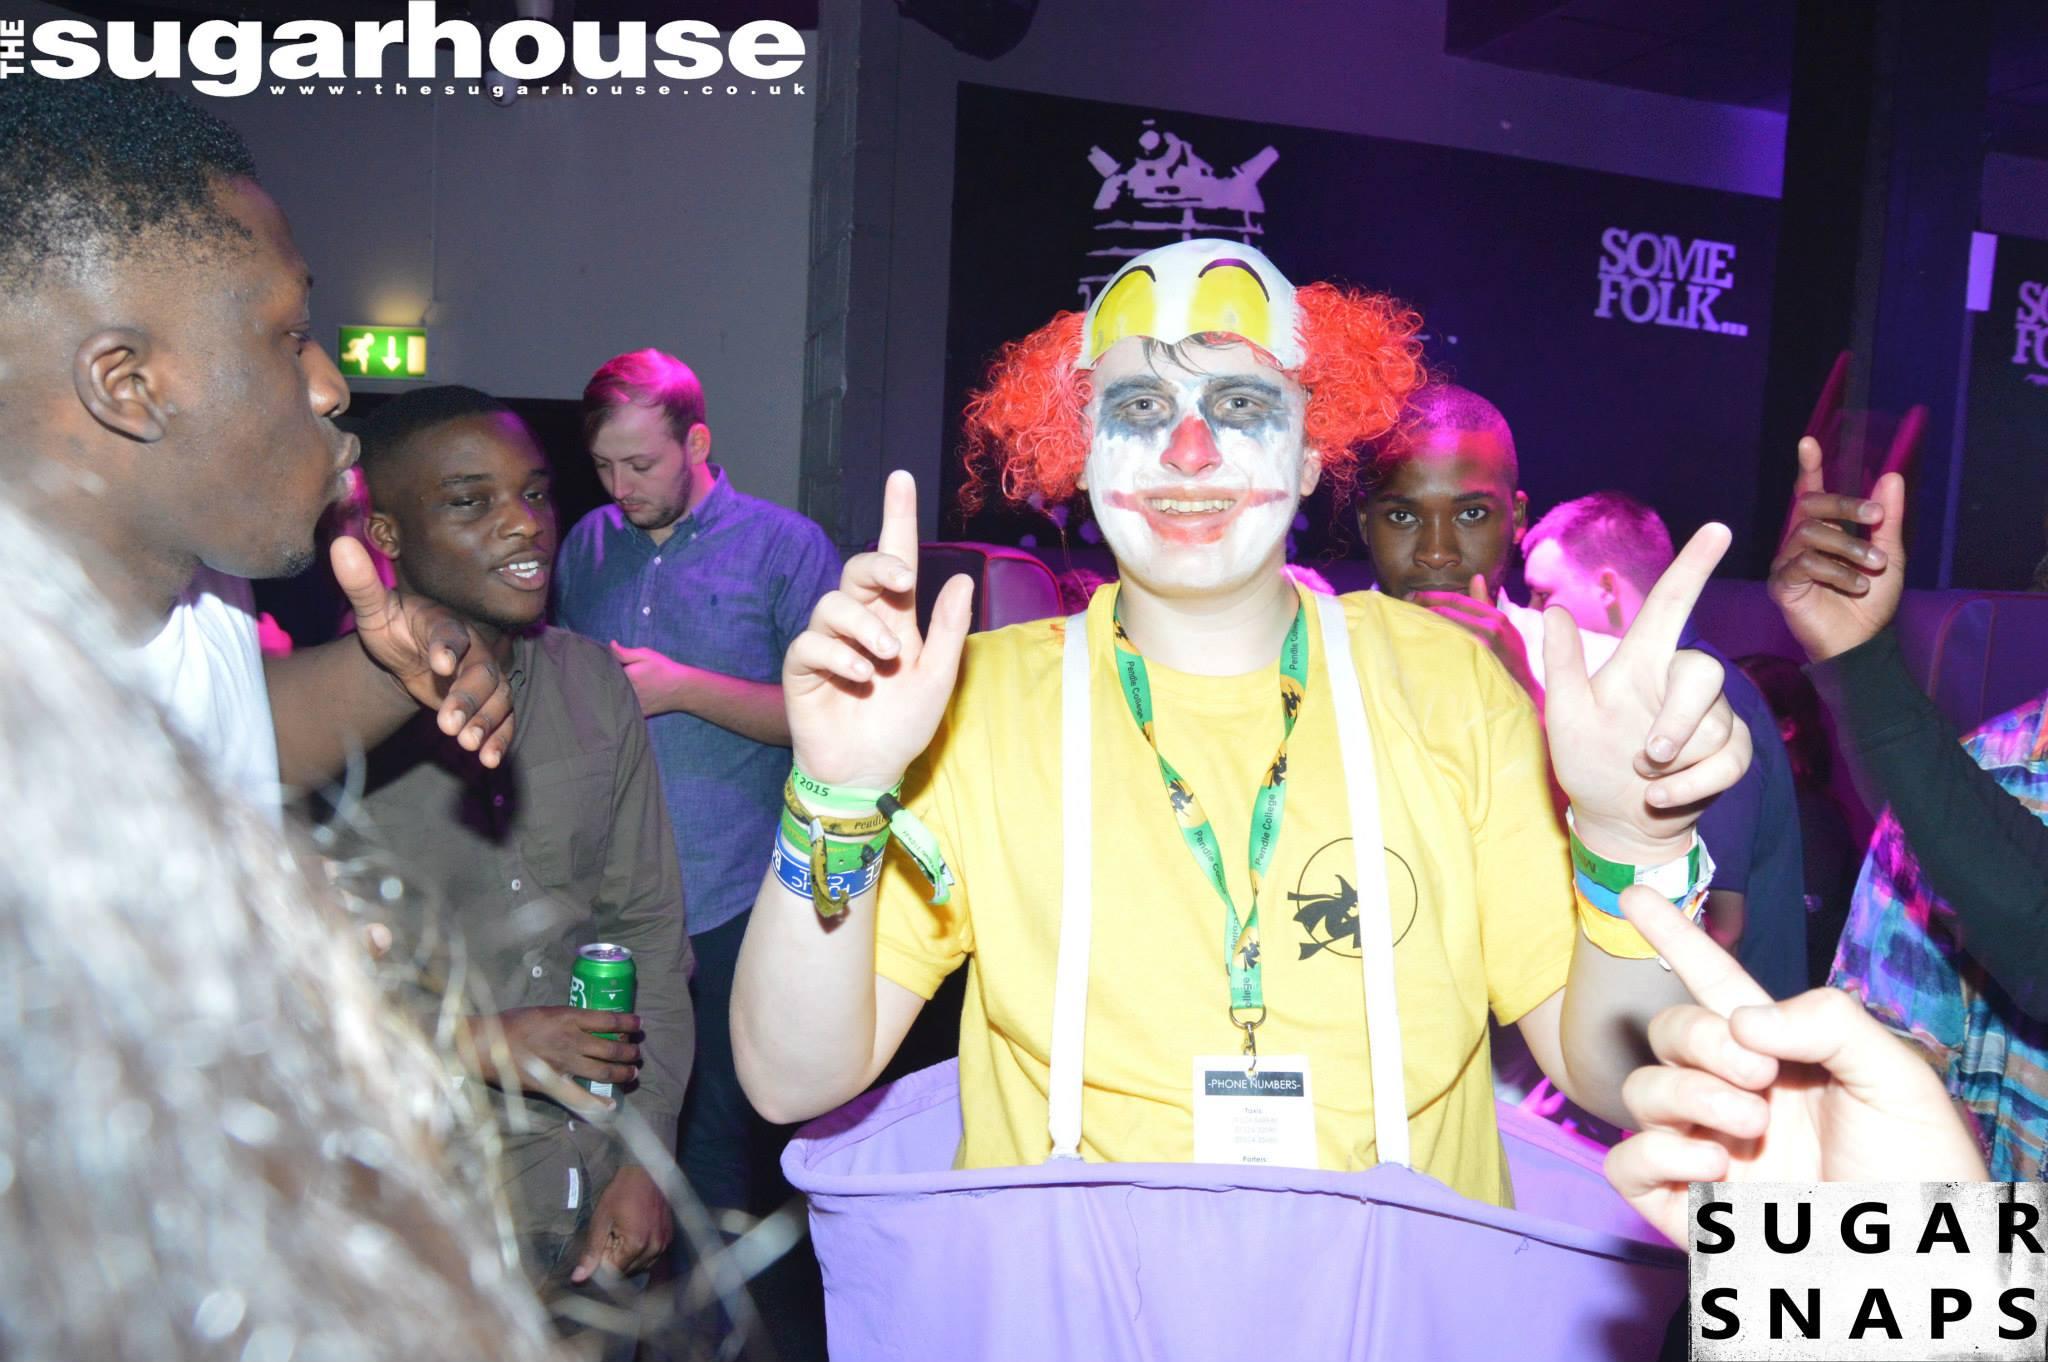 I am clown, here I am